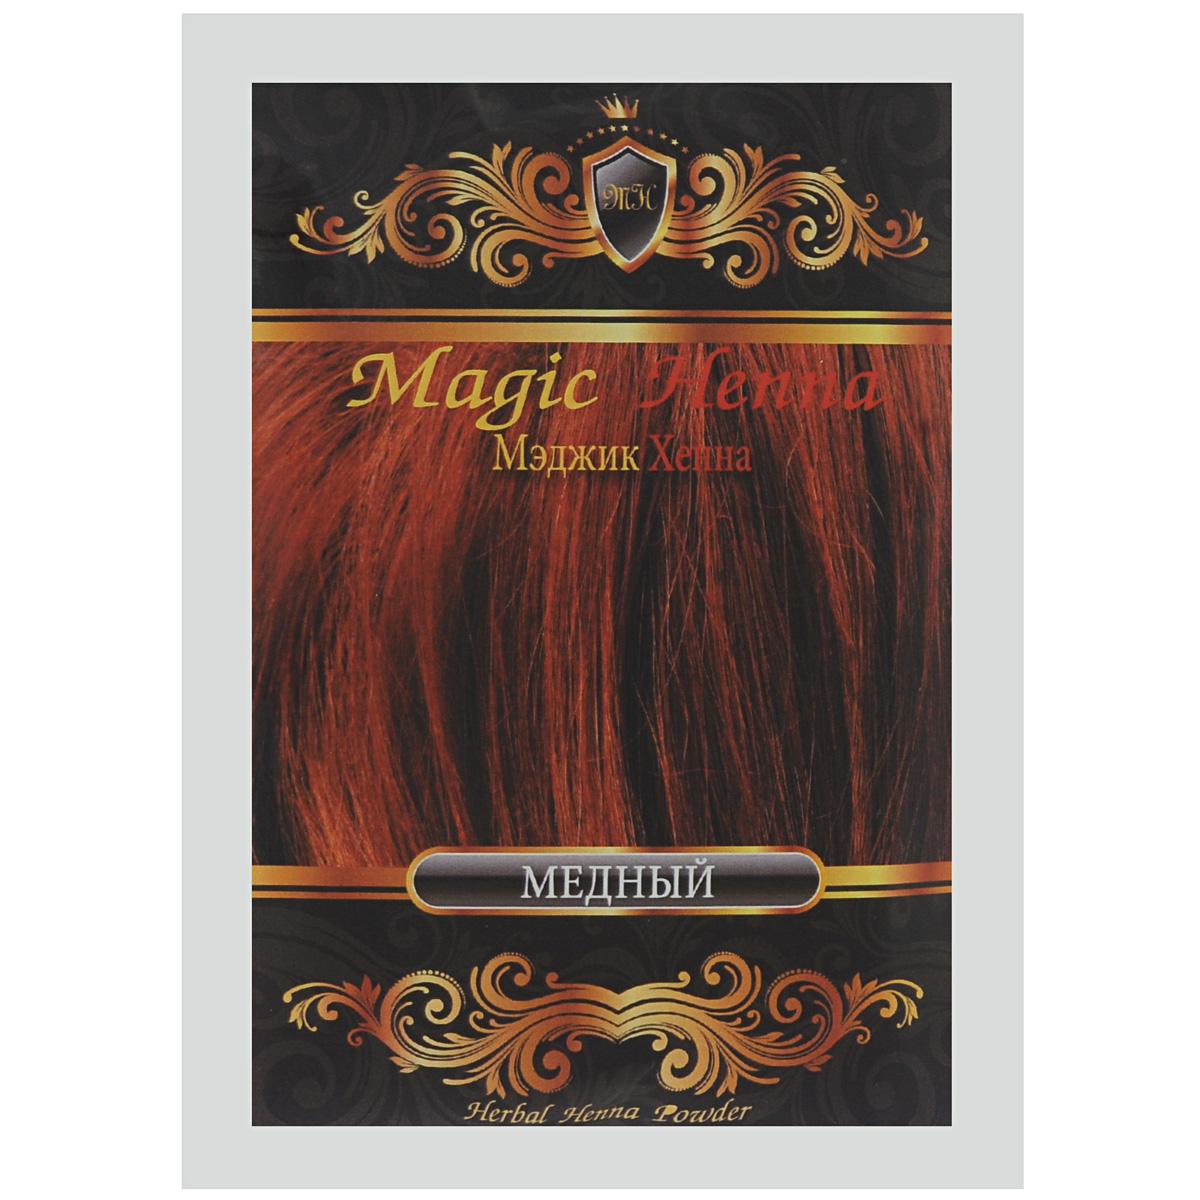 Magic Henna Лечебная травяная краска для волос с хной, медный (Herbal Pure Henna), 100 г7145Лечебная травяная краска с хной Magic Henna - Темно-коричневый (Dark Brown)